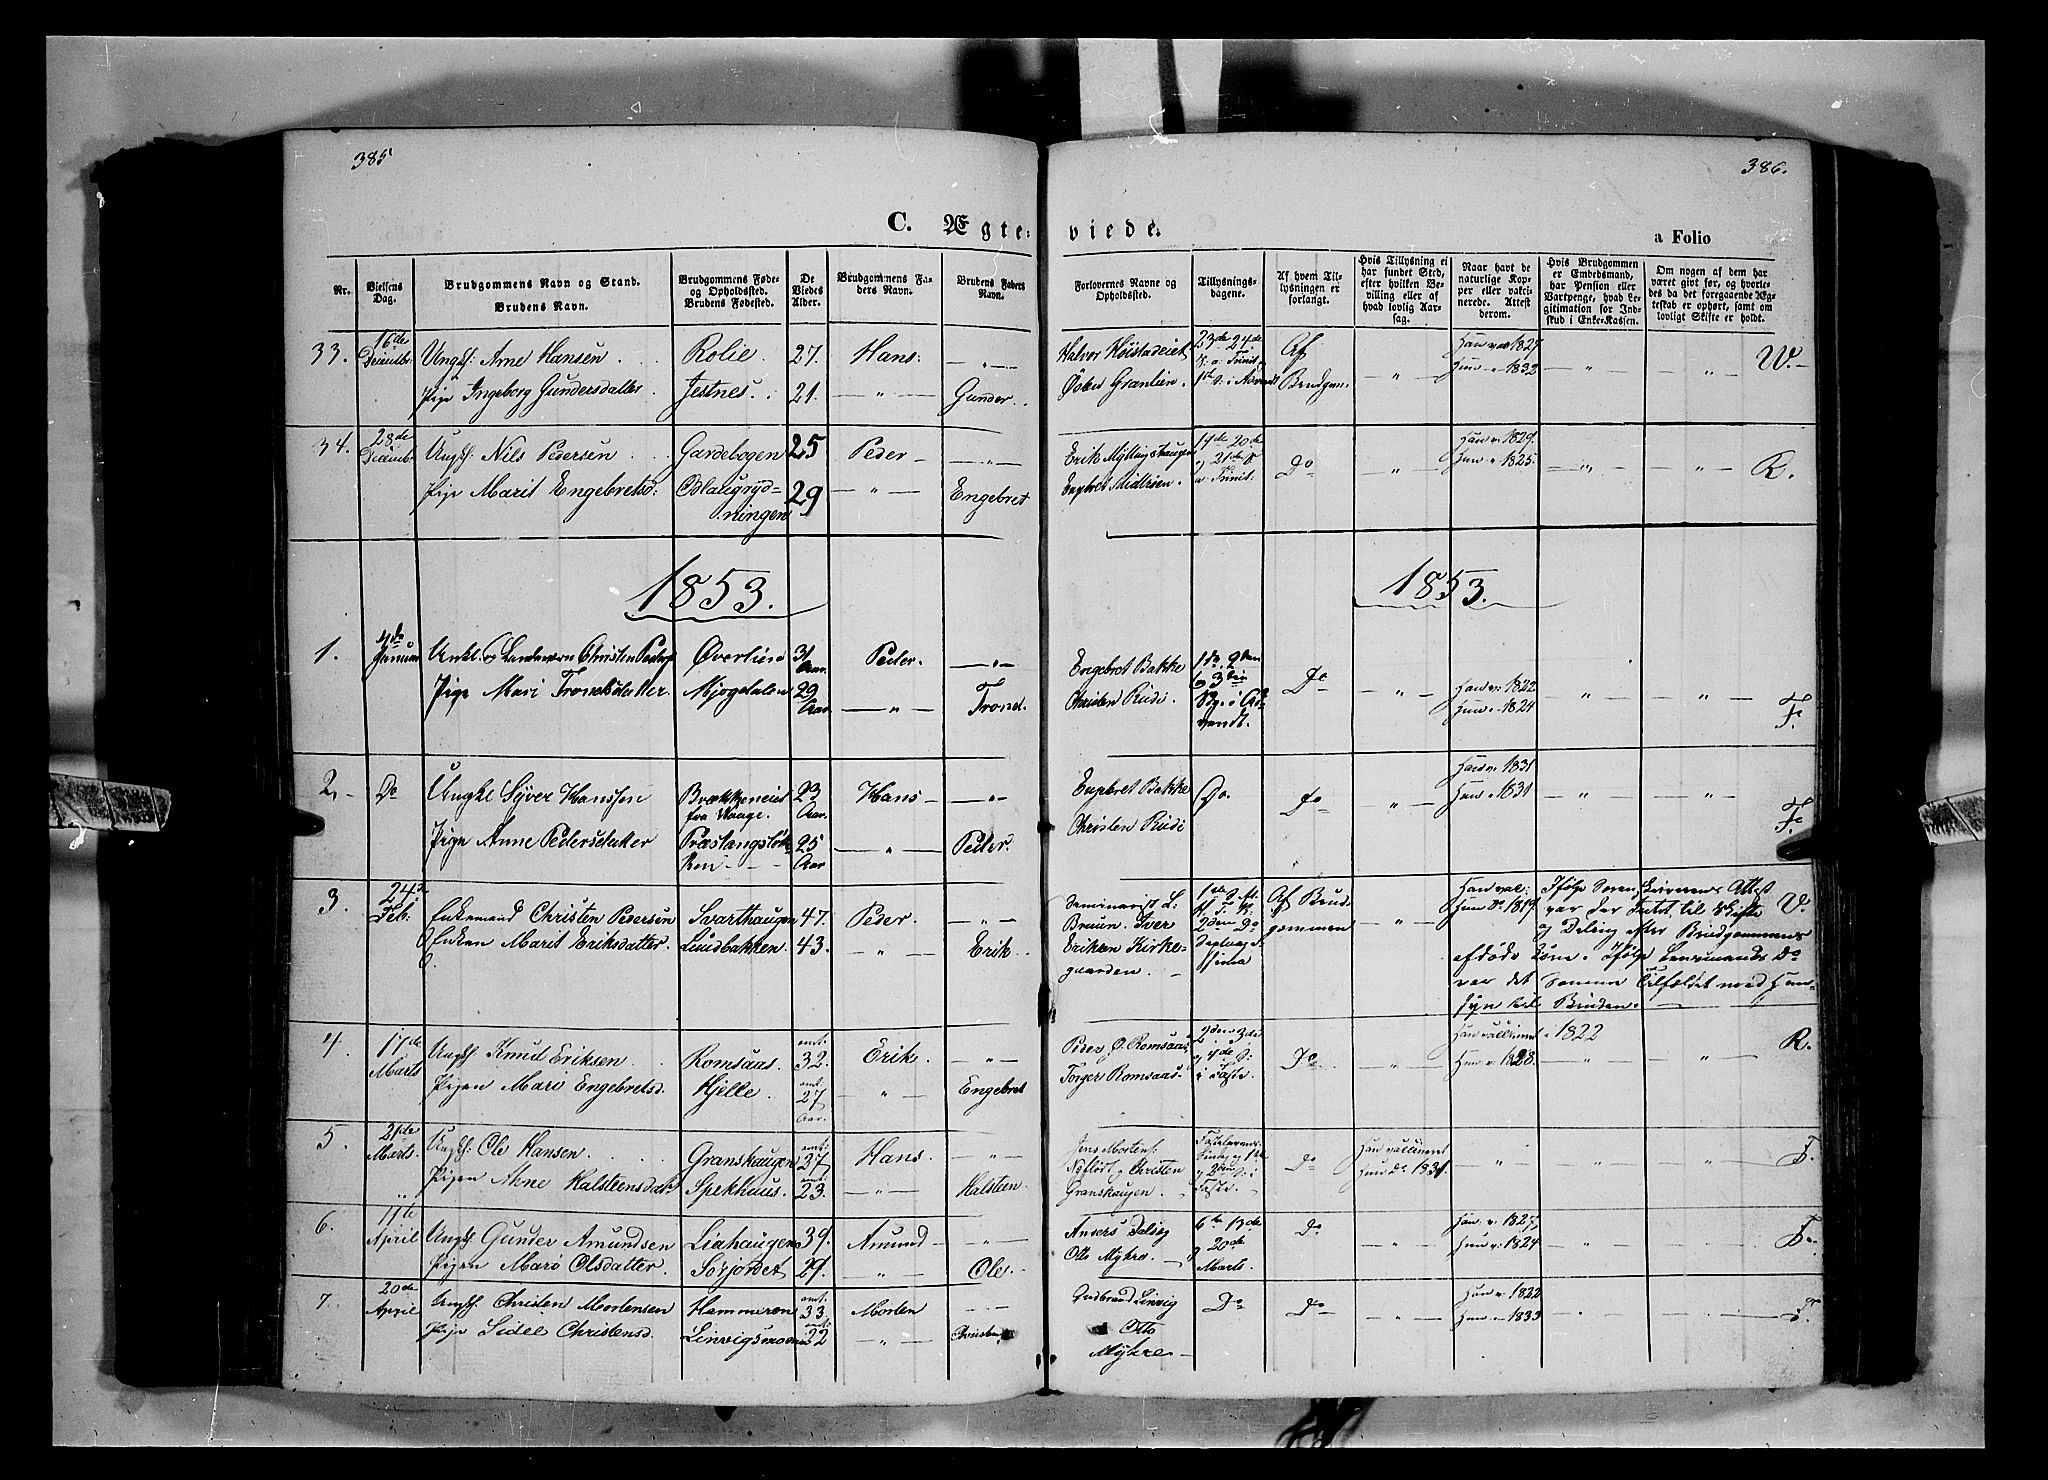 SAH, Ringebu prestekontor, Ministerialbok nr. 6, 1848-1859, s. 385-386